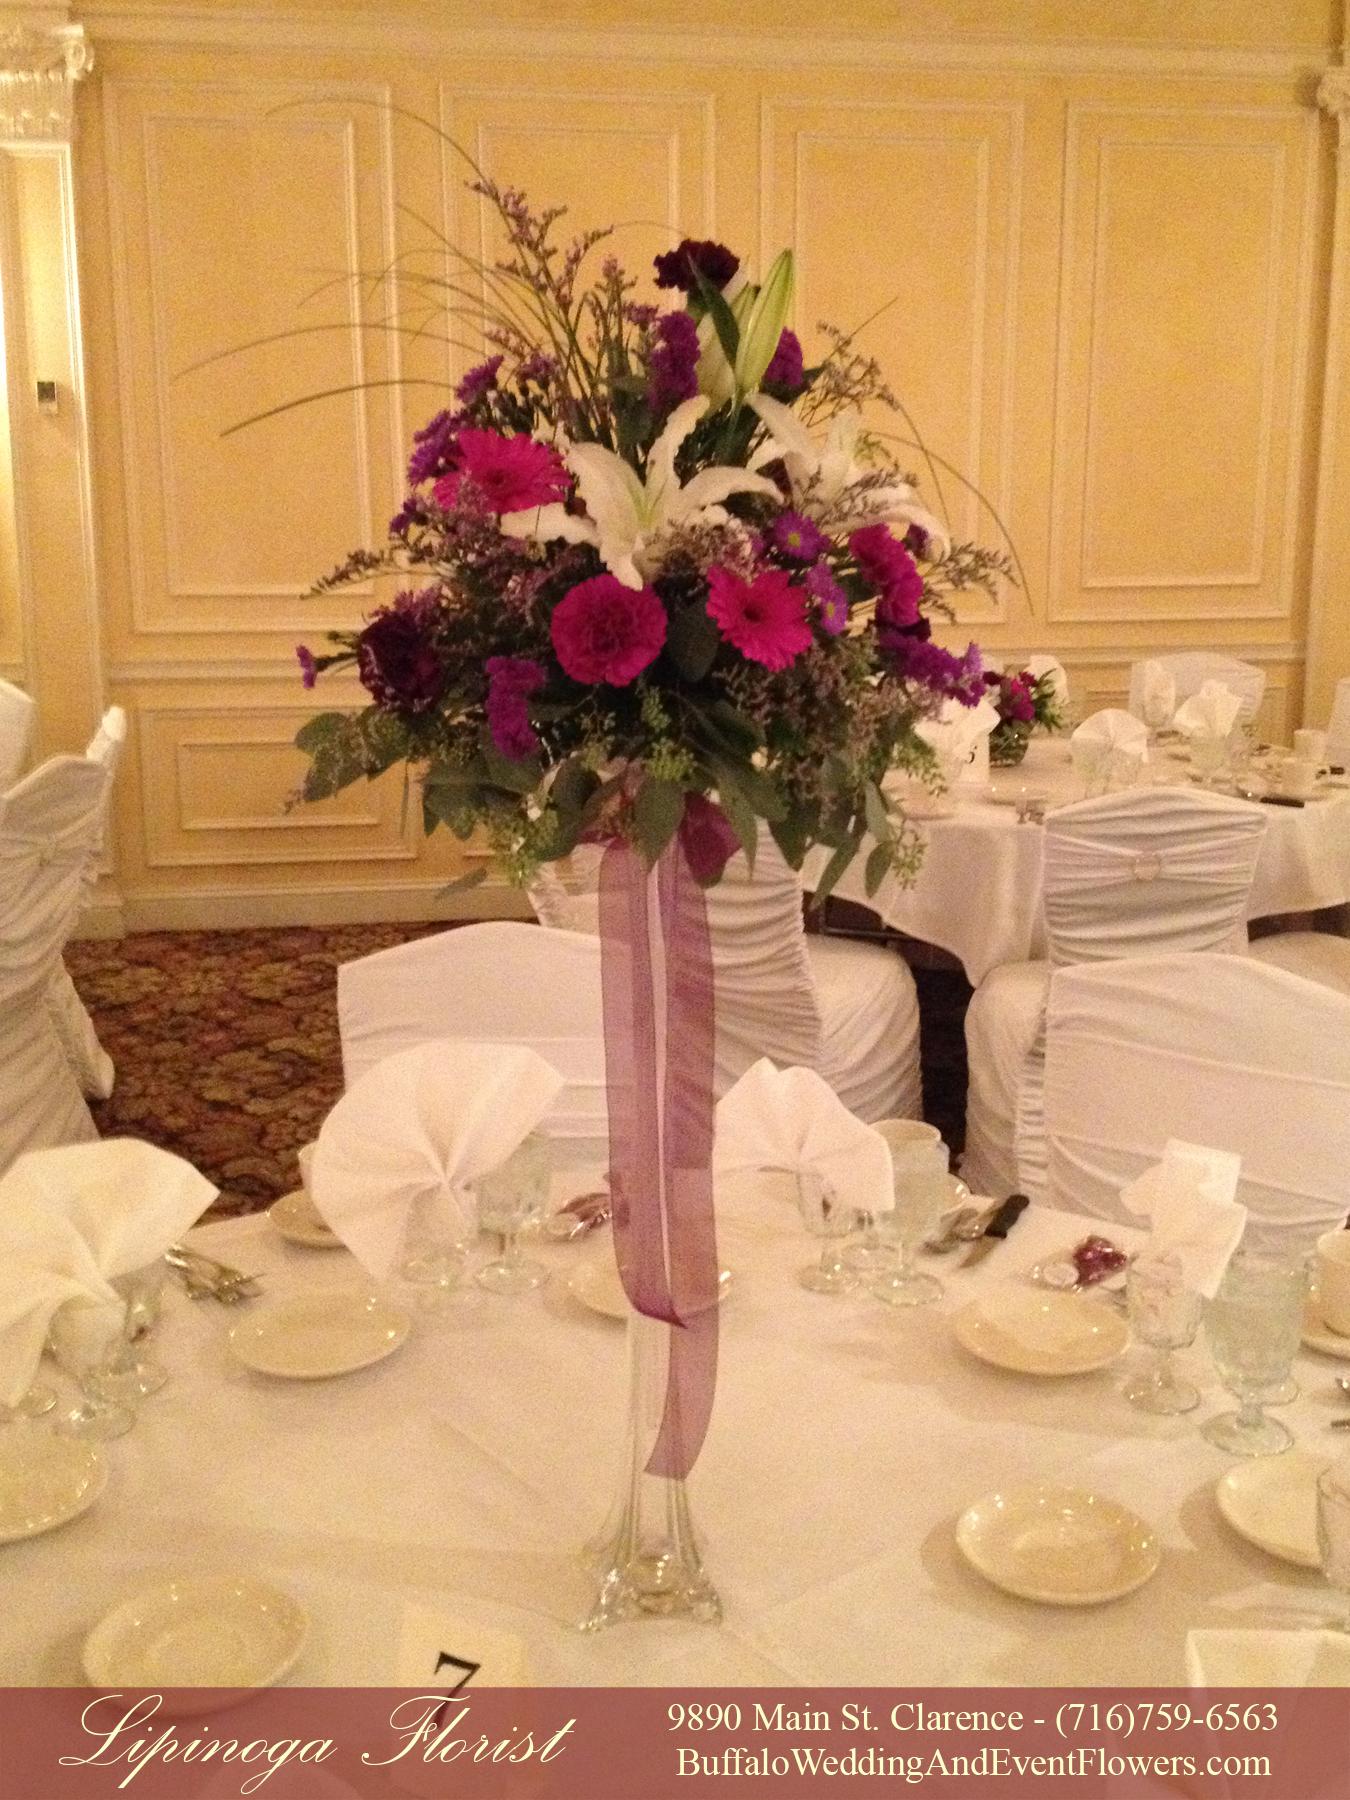 Eiffel tower vase buffalo wedding event flowers by lipinoga wedding florist williamsville ny reviewsmspy